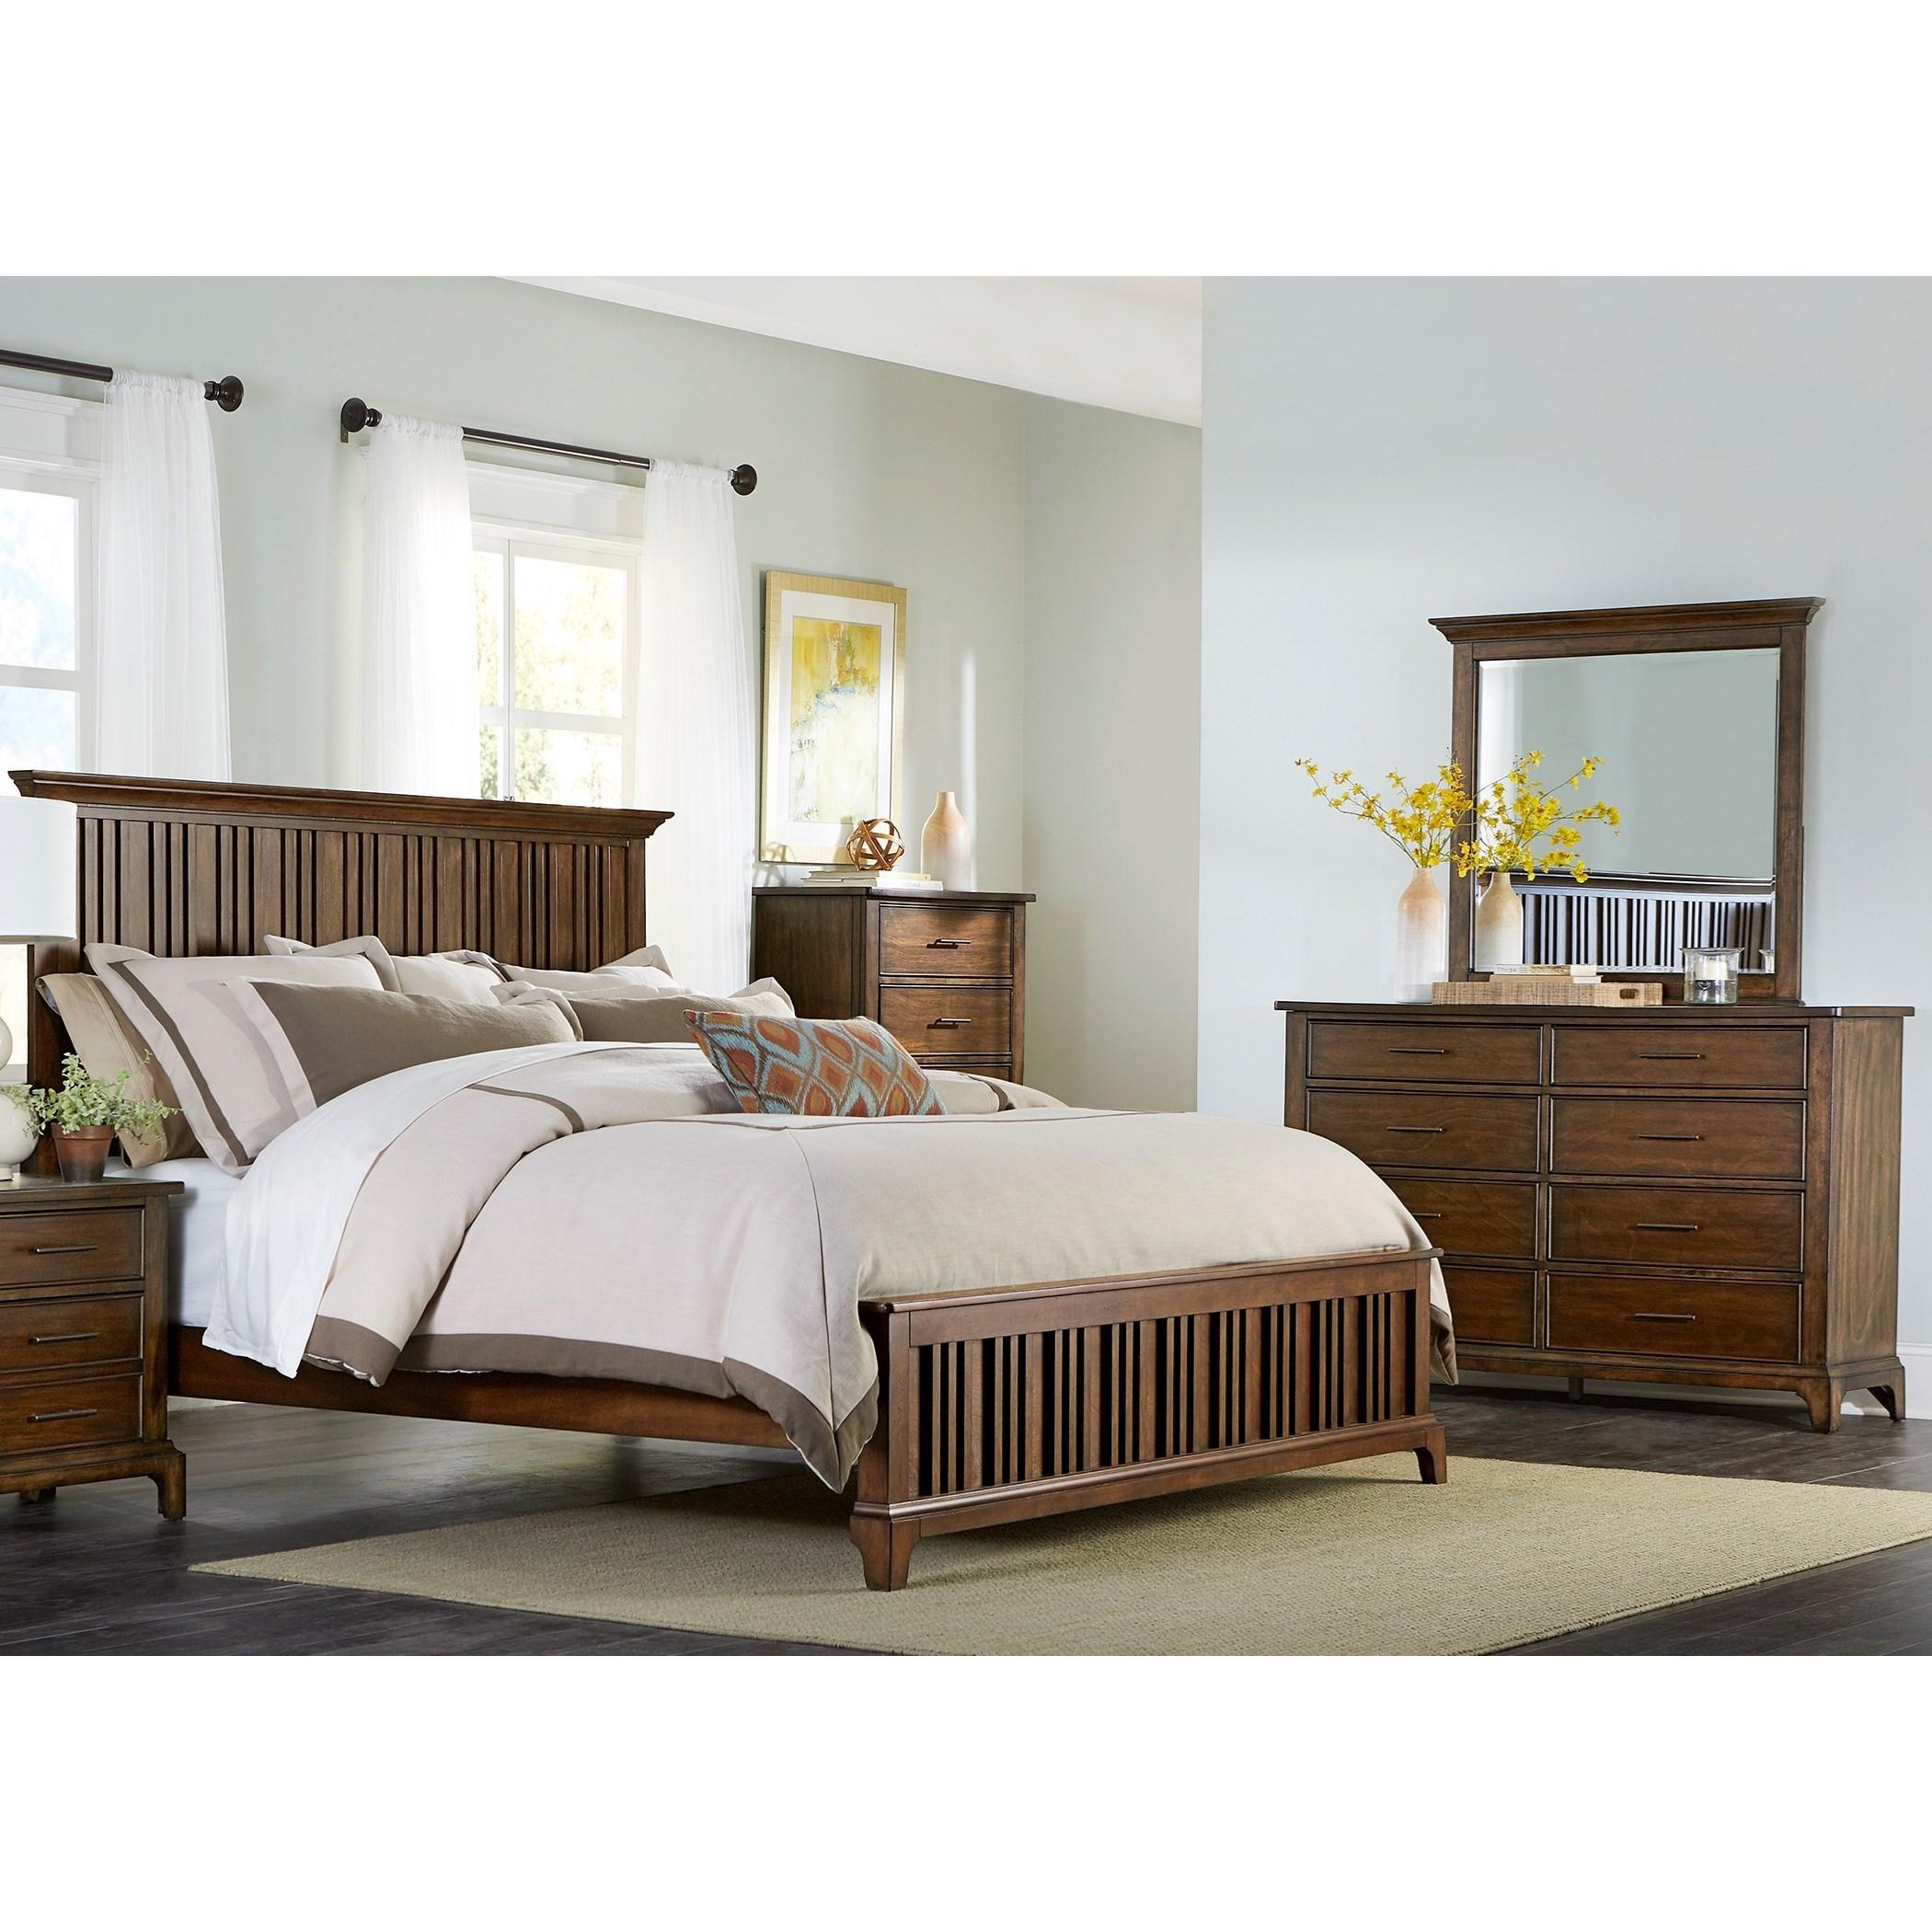 liberty hello laurel set platform bedroom pic furniture sets customizable creek kitty